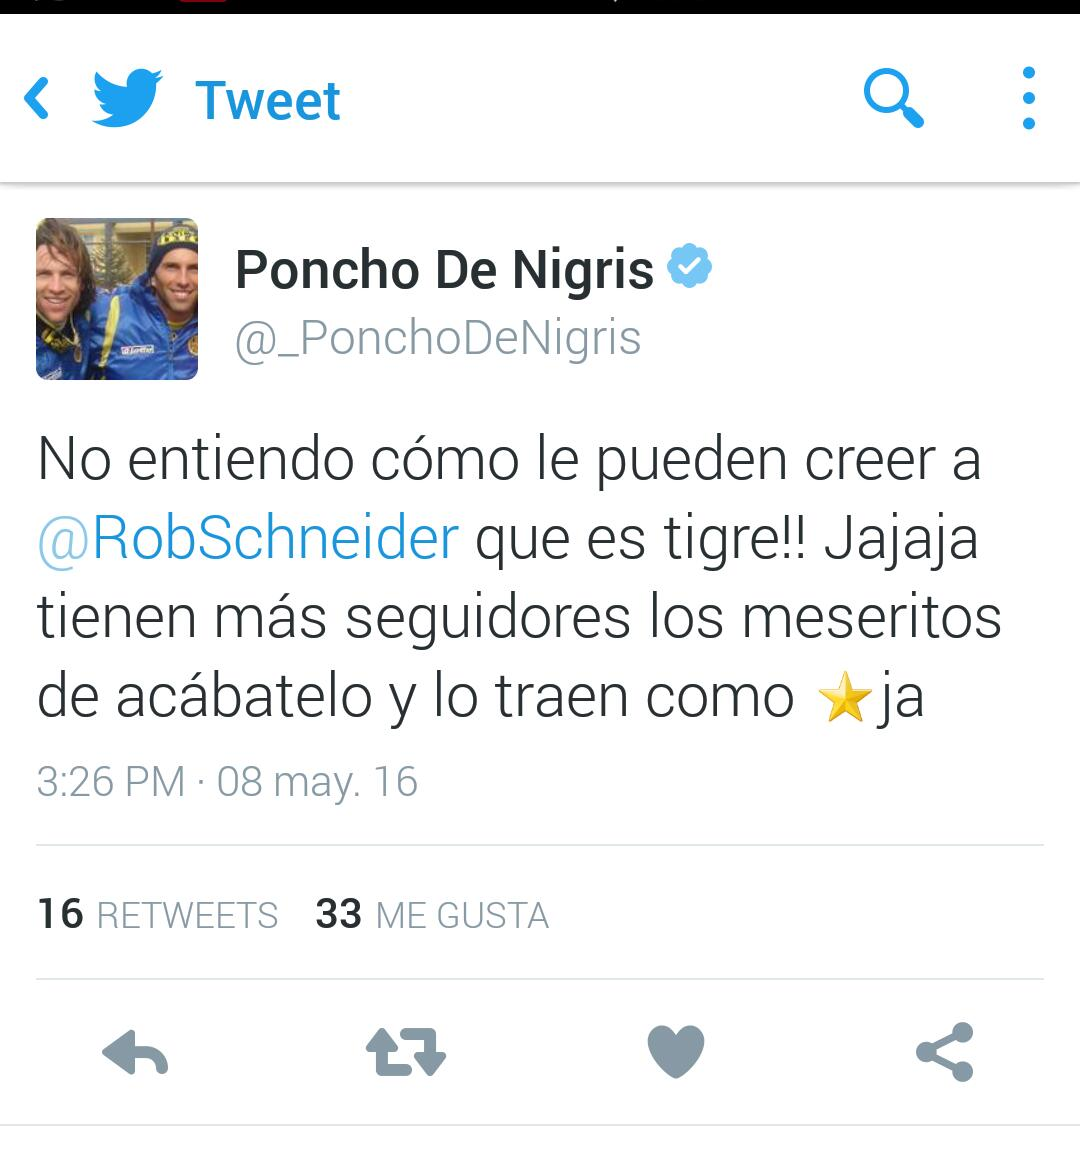 PONCHO DE NIGRIS tuit 1